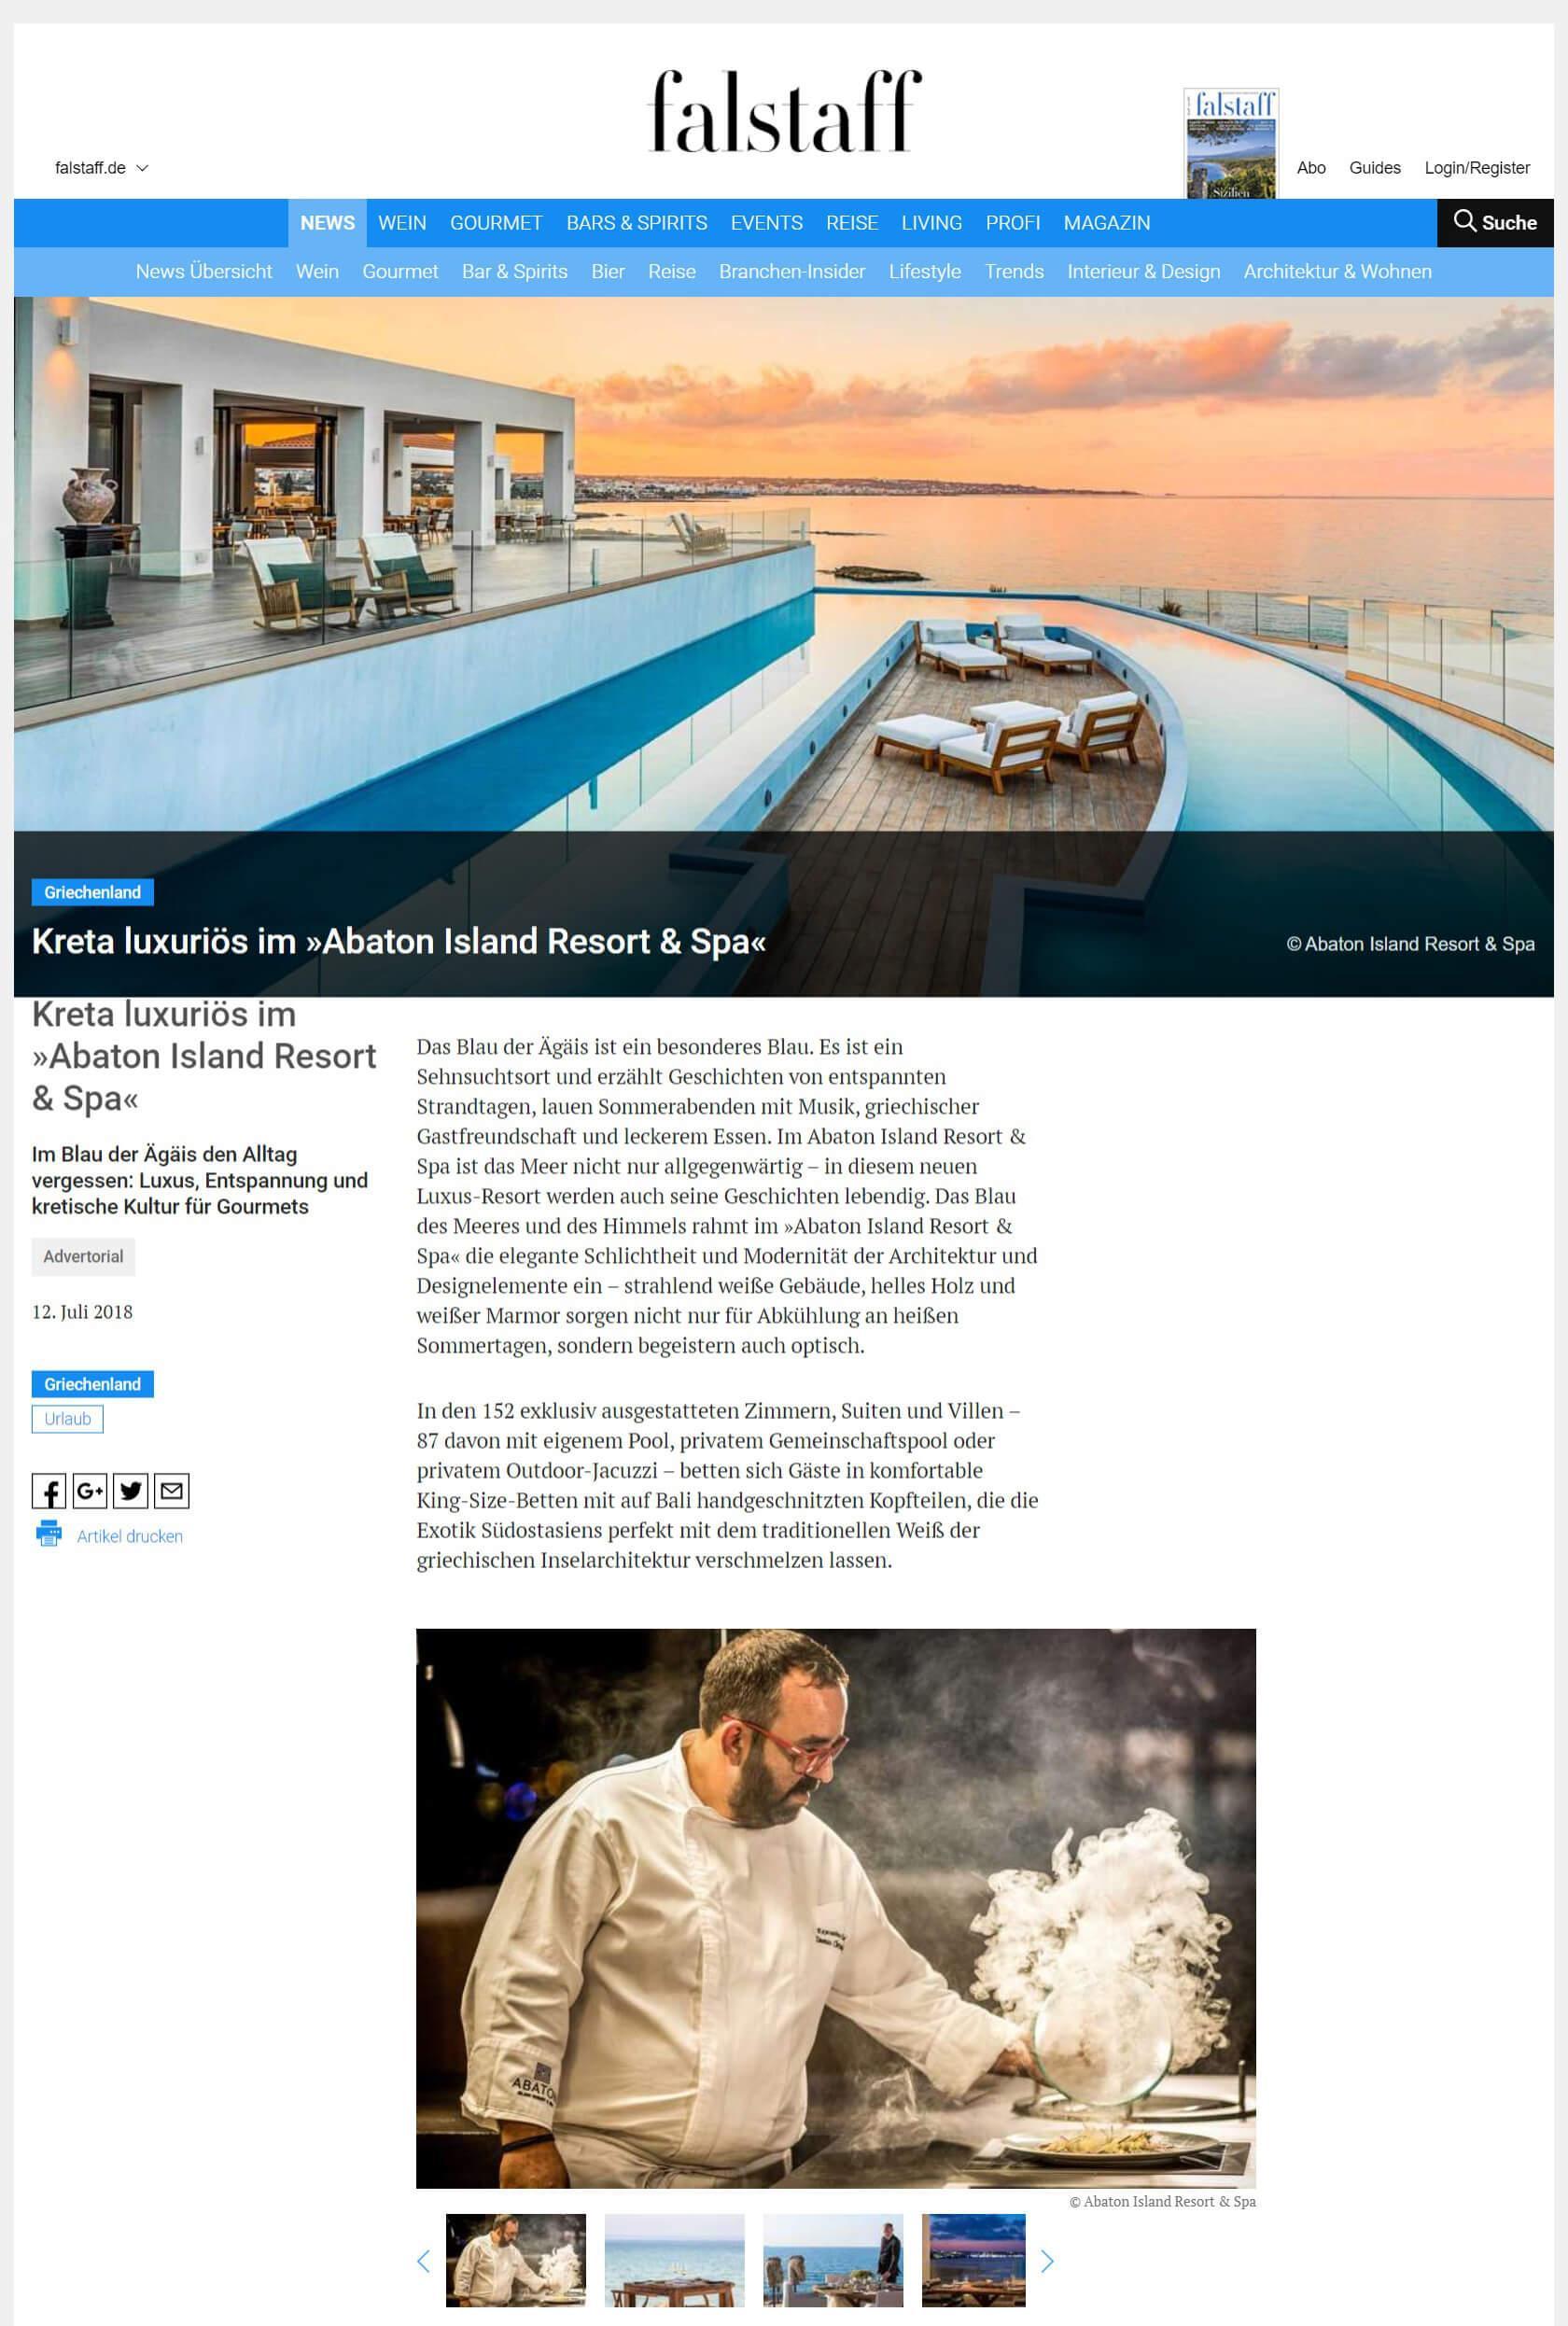 Crete luxury at Abaton Island Resort & Spa